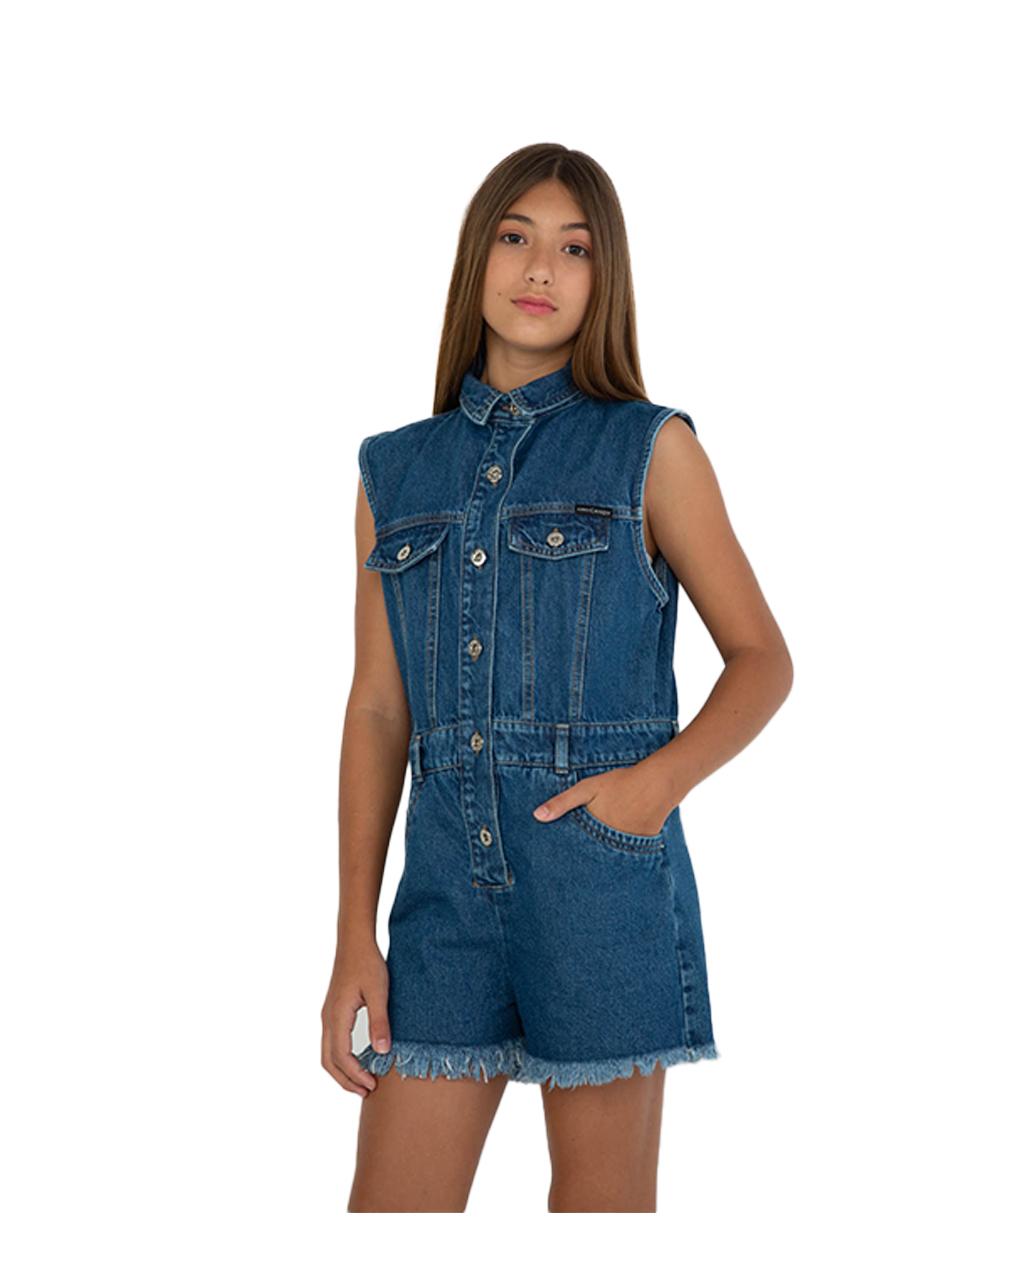 Macacão Teen Curto Jeans Dimy Candy